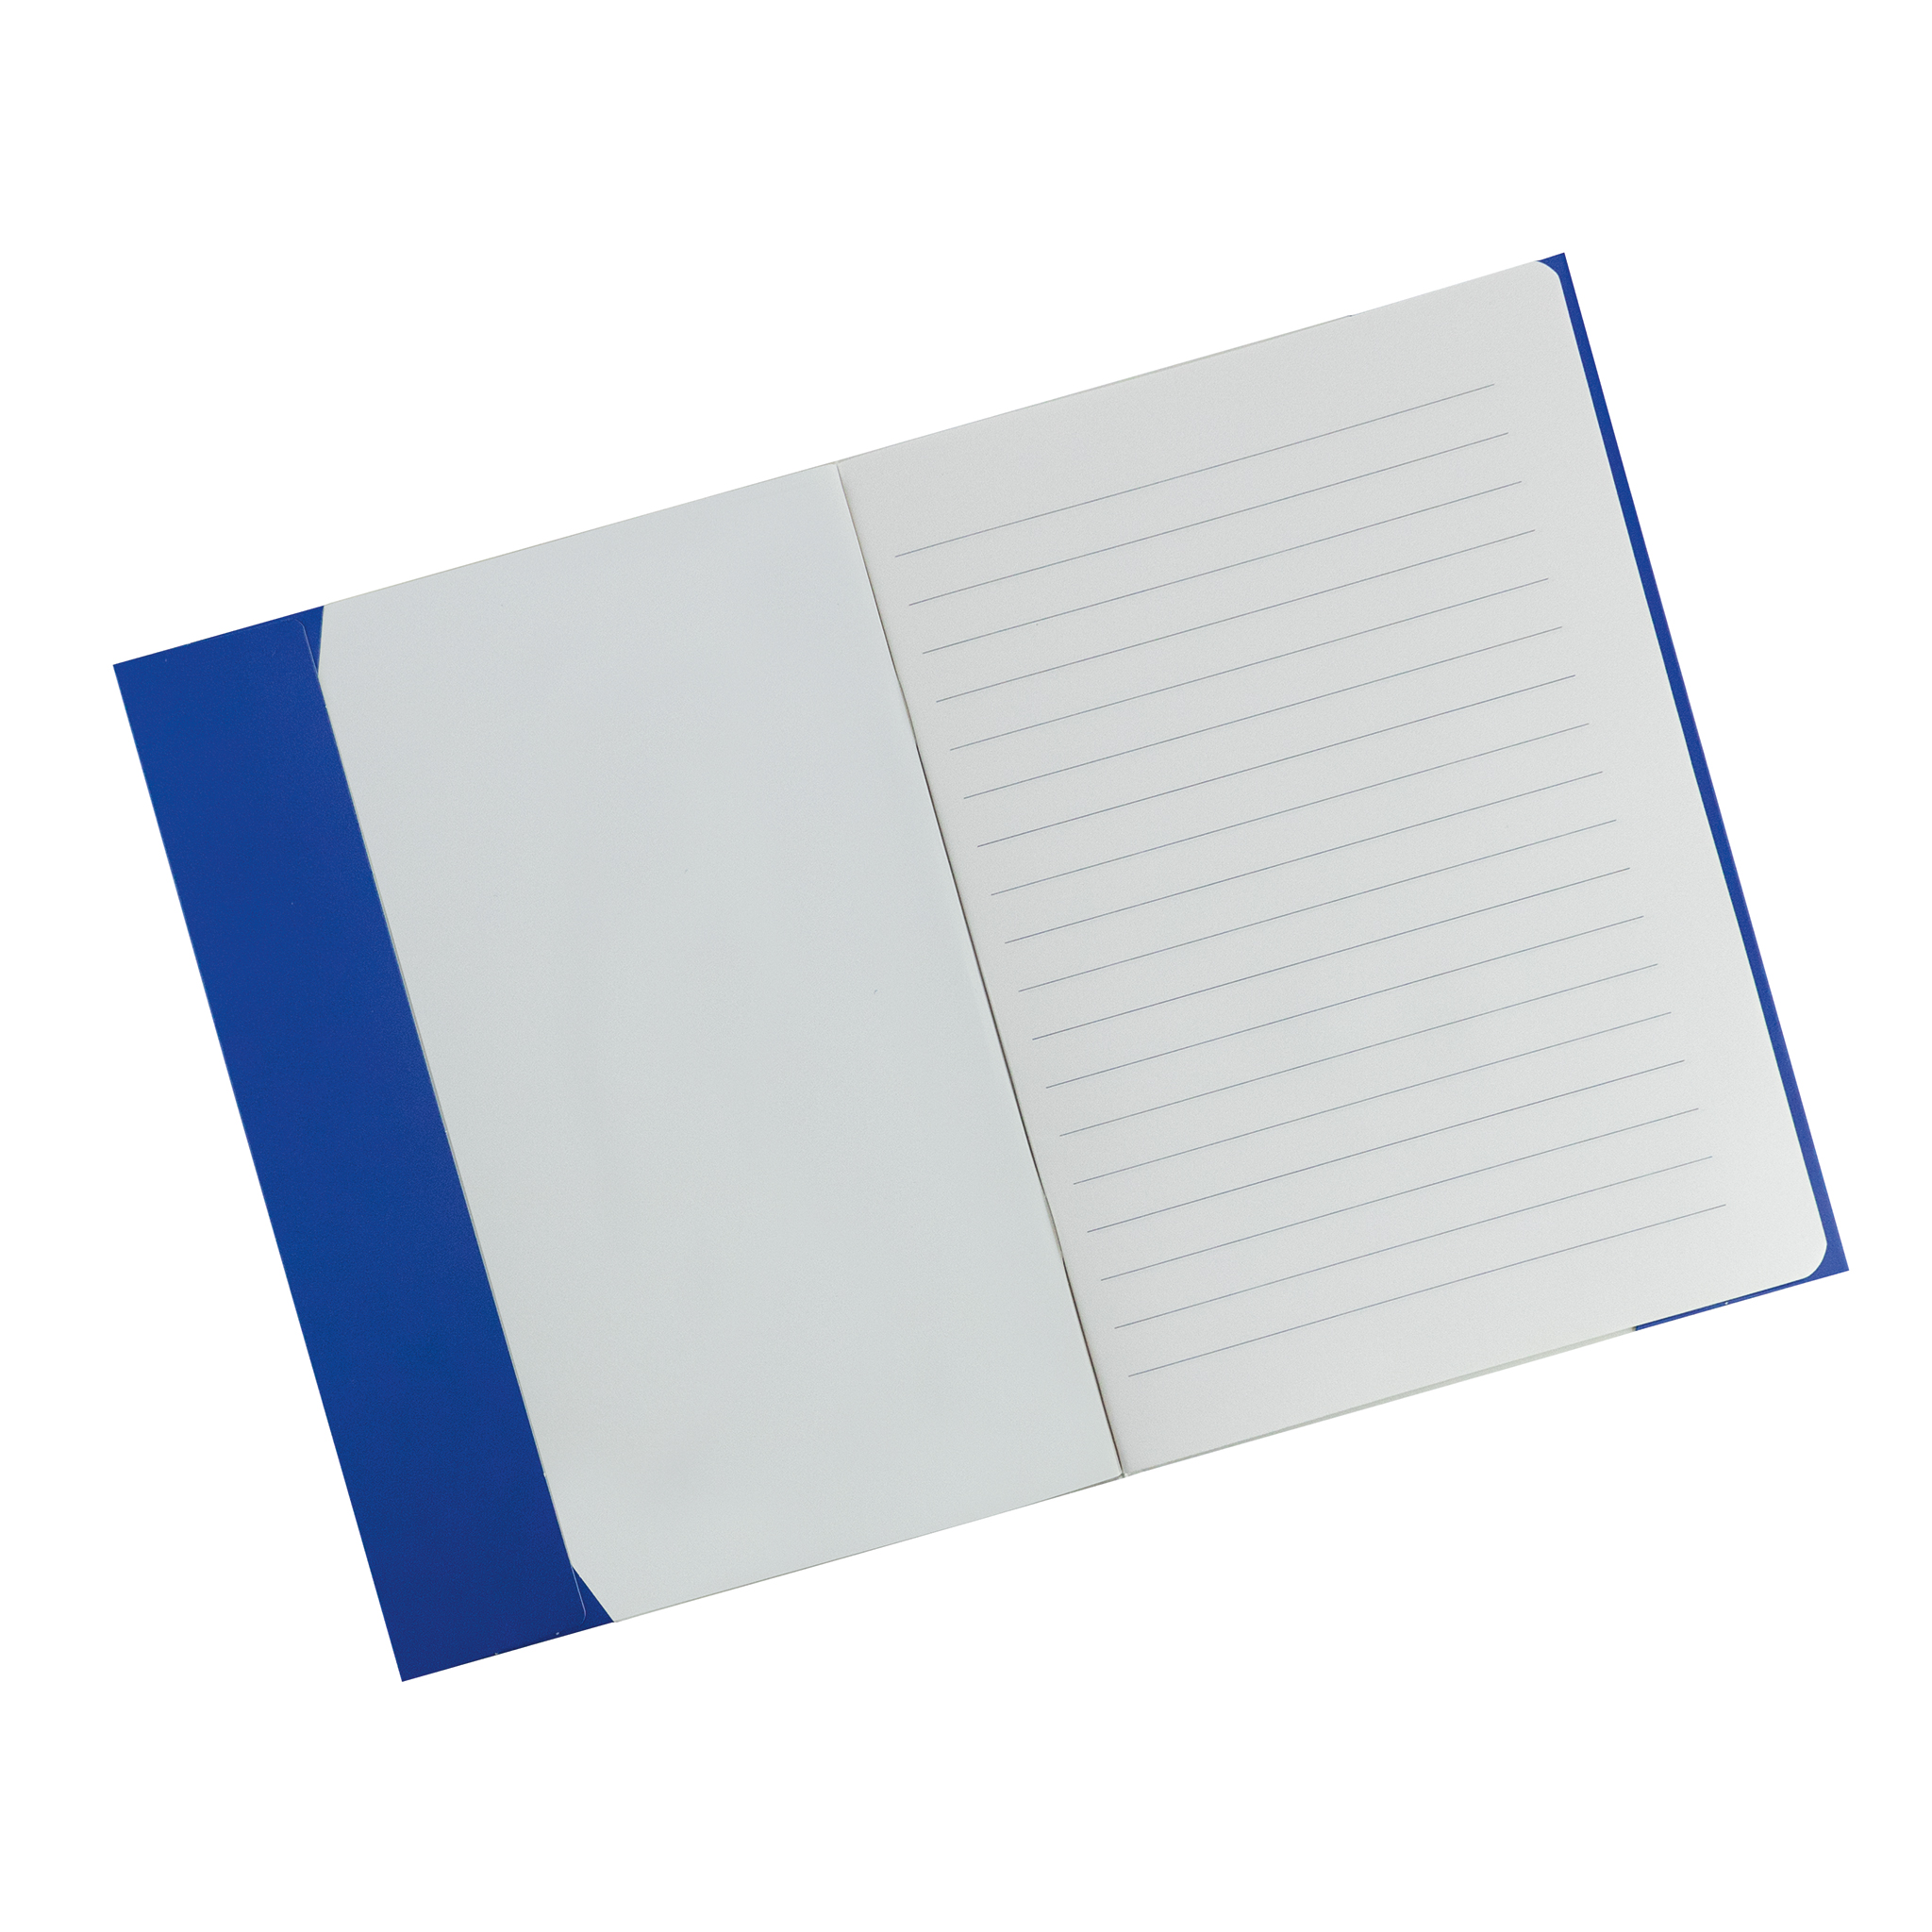 HERMA Heftschoner aus Karton DIN A5 dunkelblau